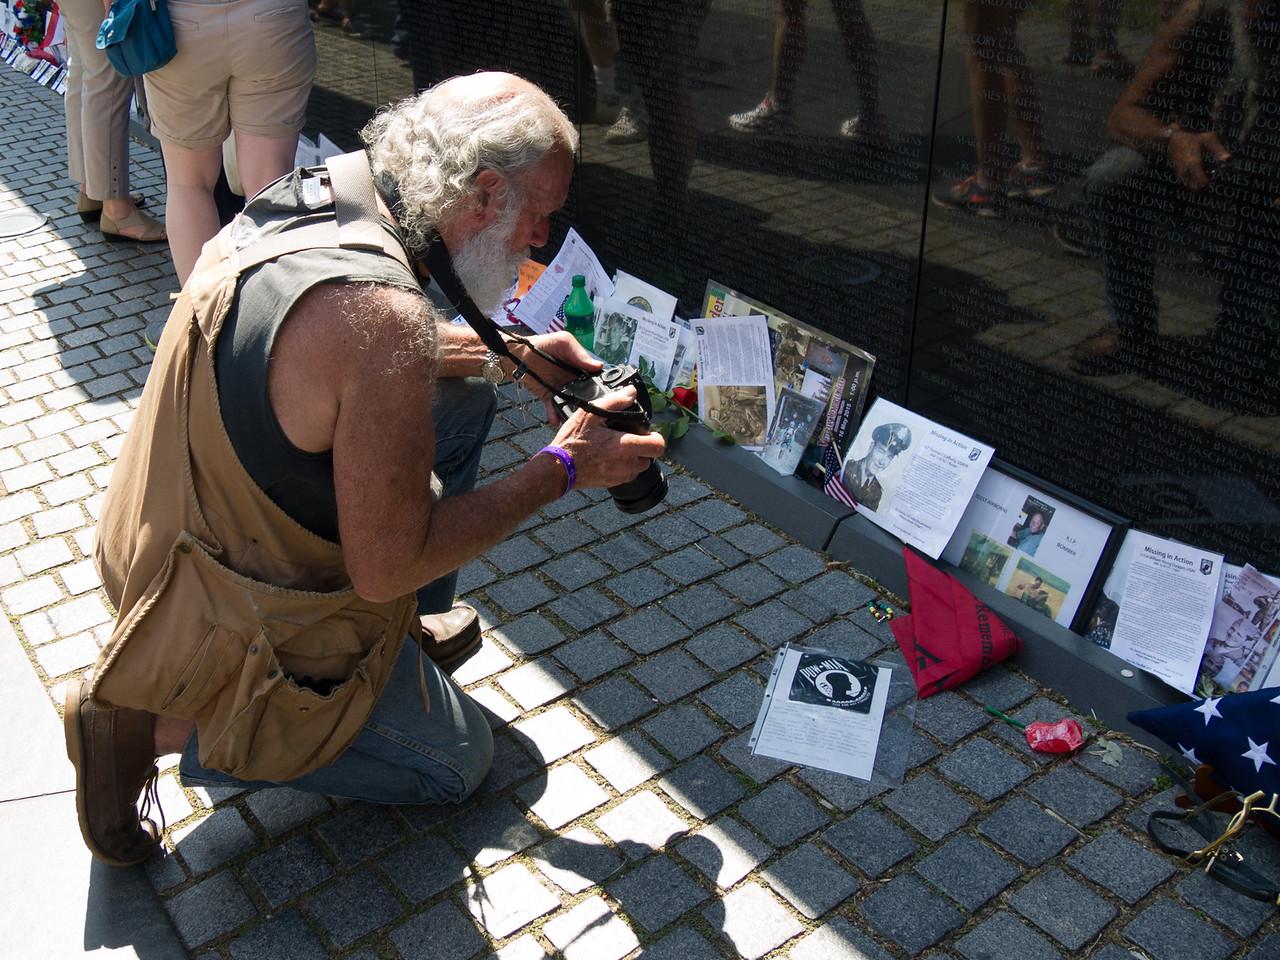 A rolling thunder participant - Vietnam veteran